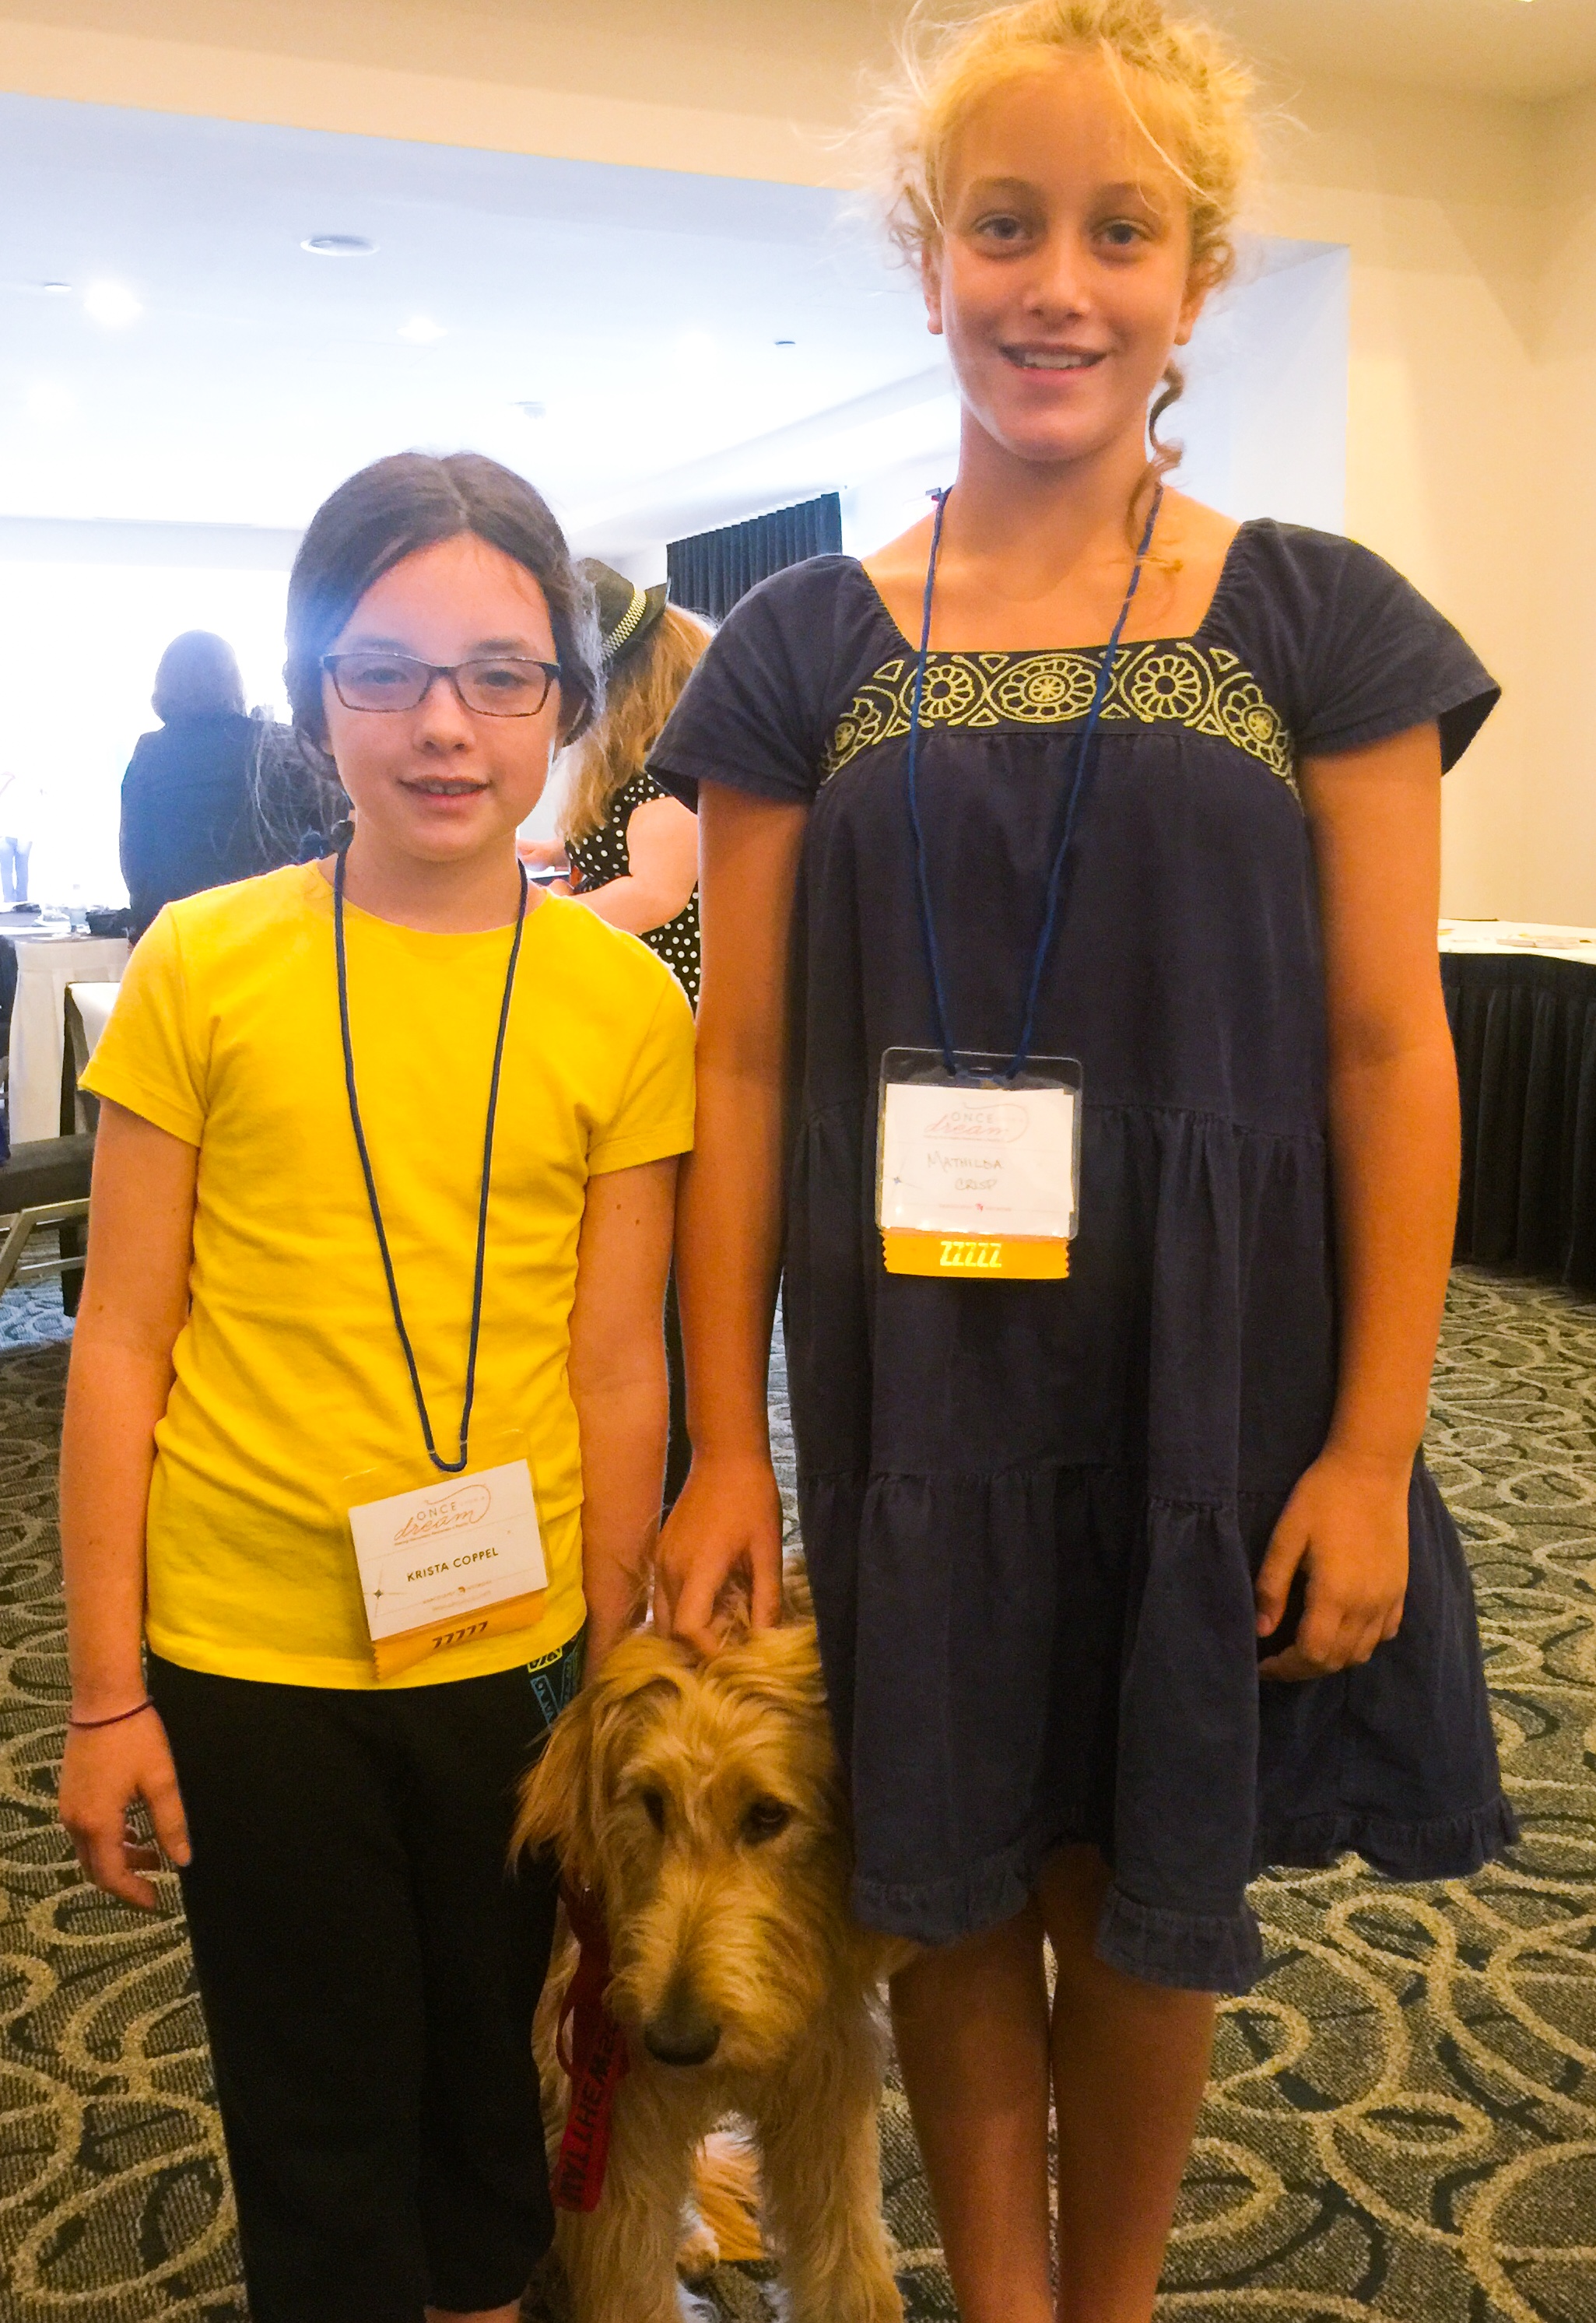 Mathilda with Krista and her service dog Buddy.